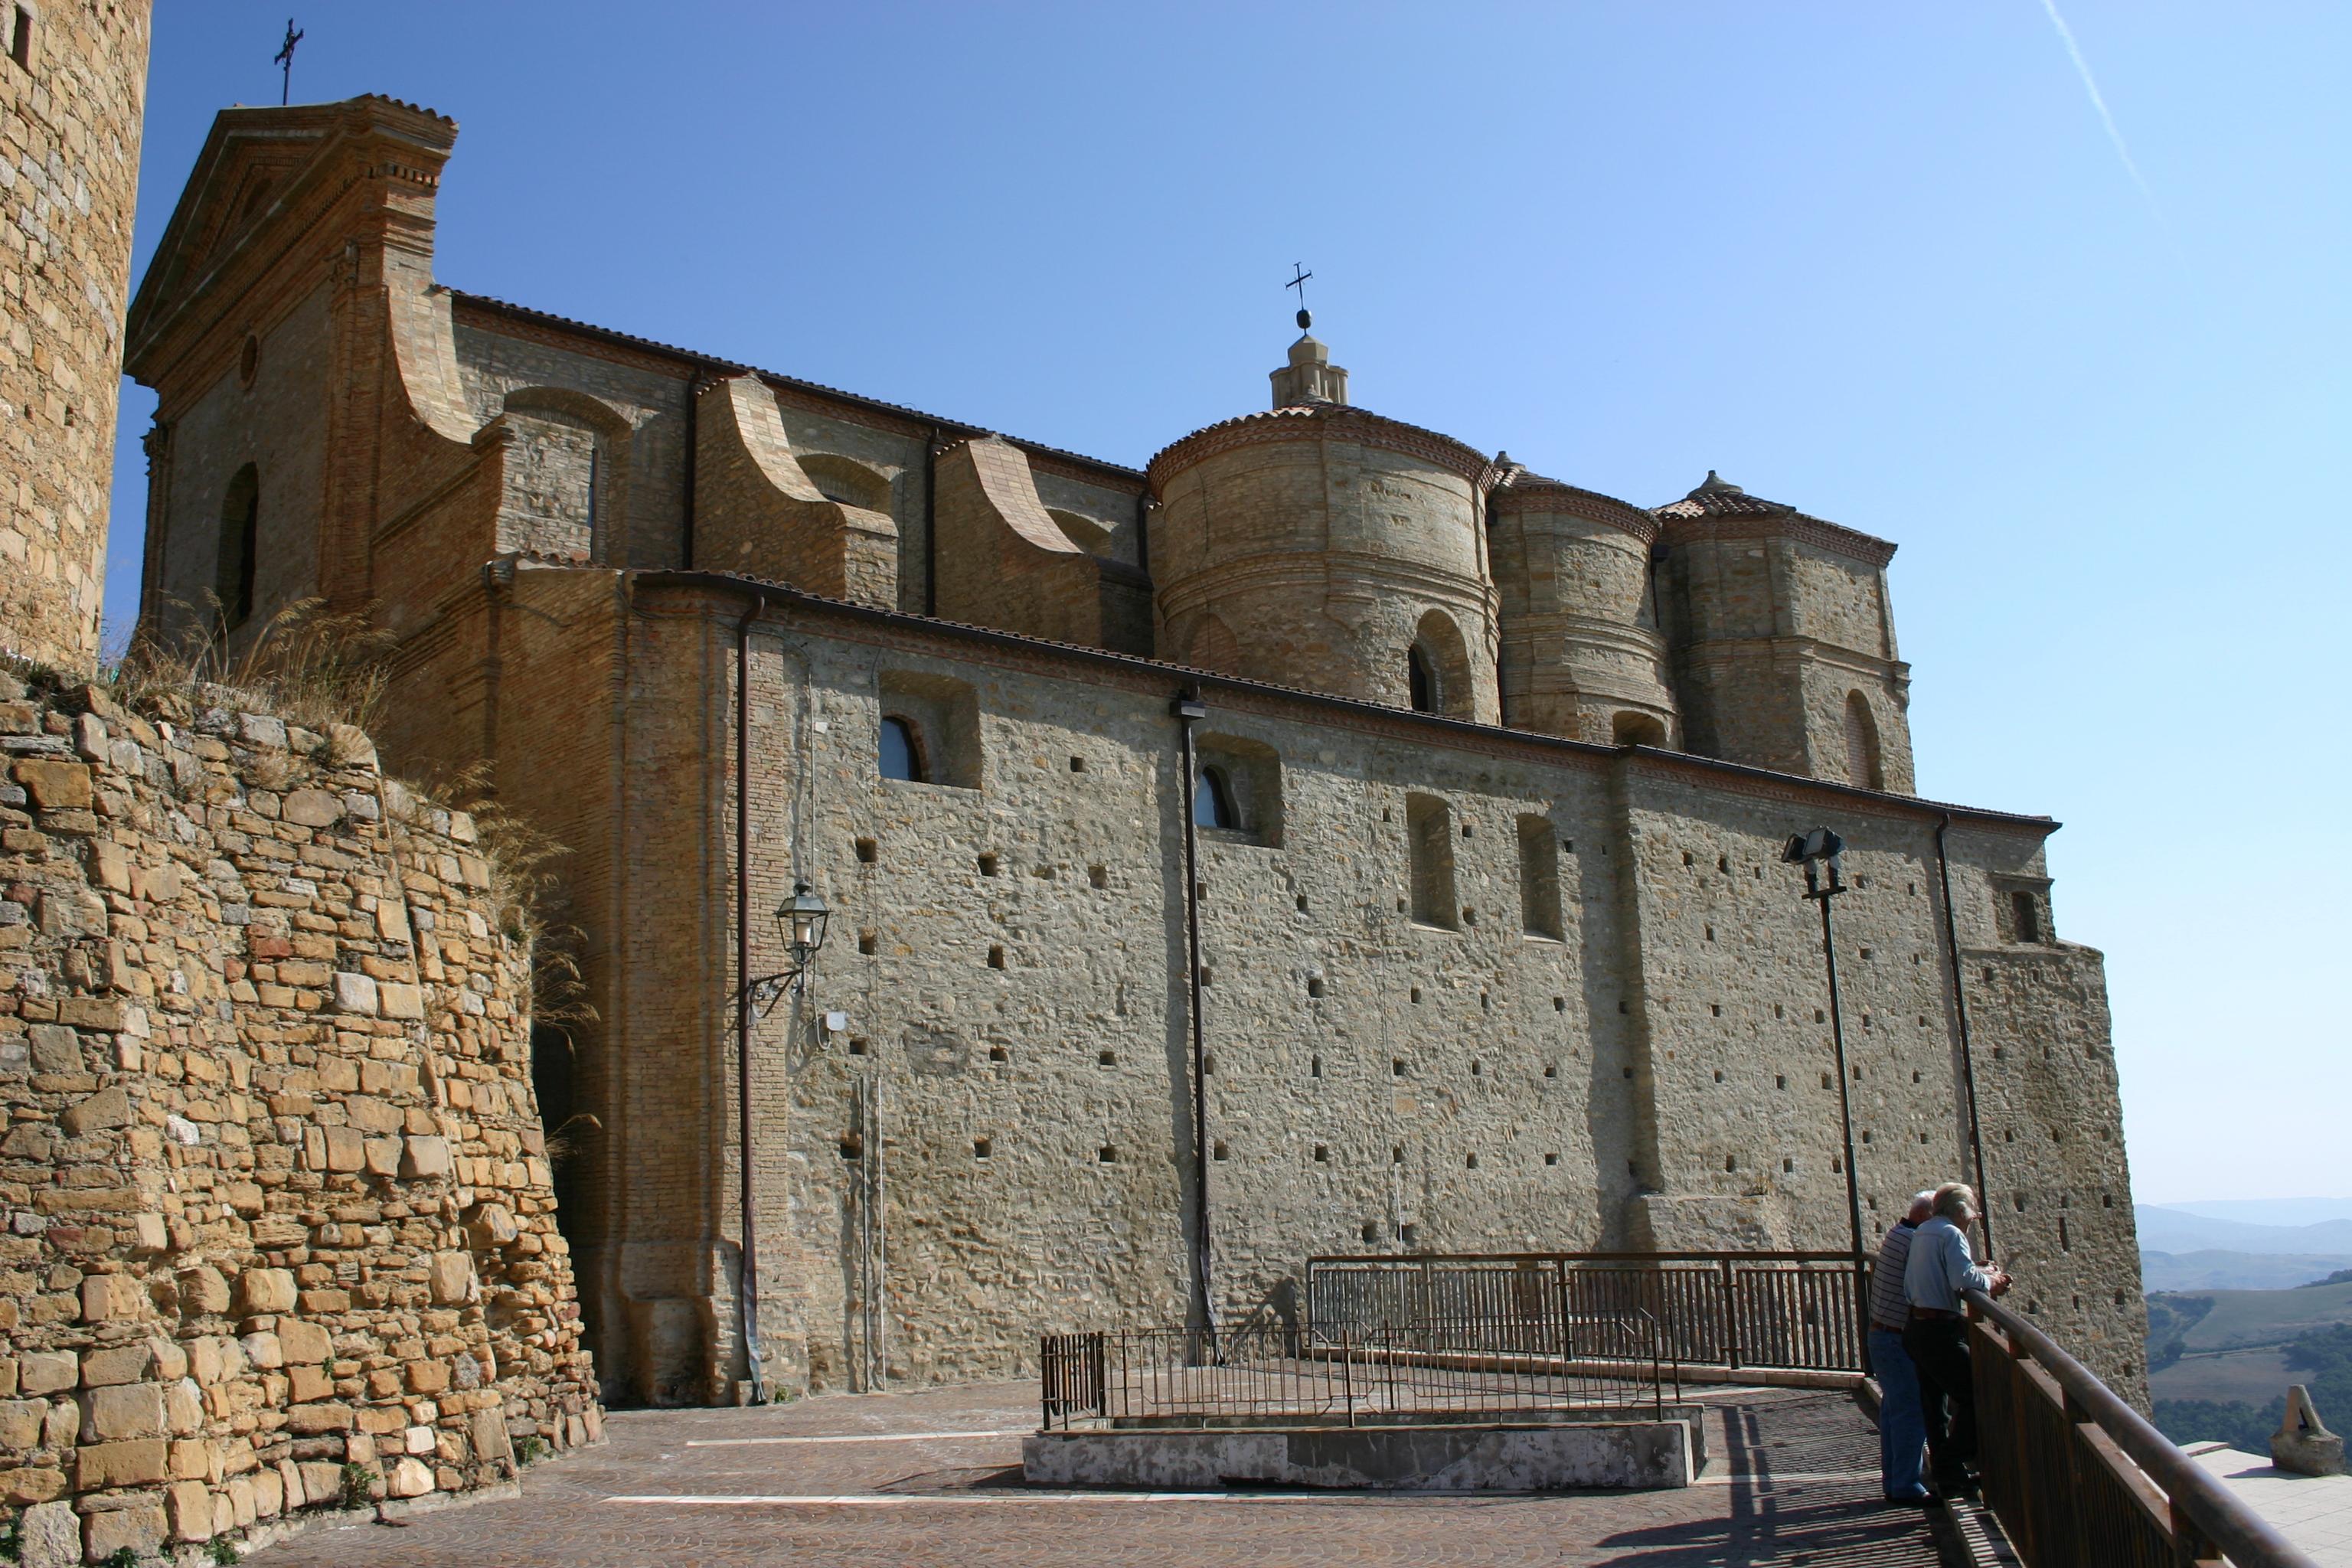 Chiesa dell'Assunta San Mauro